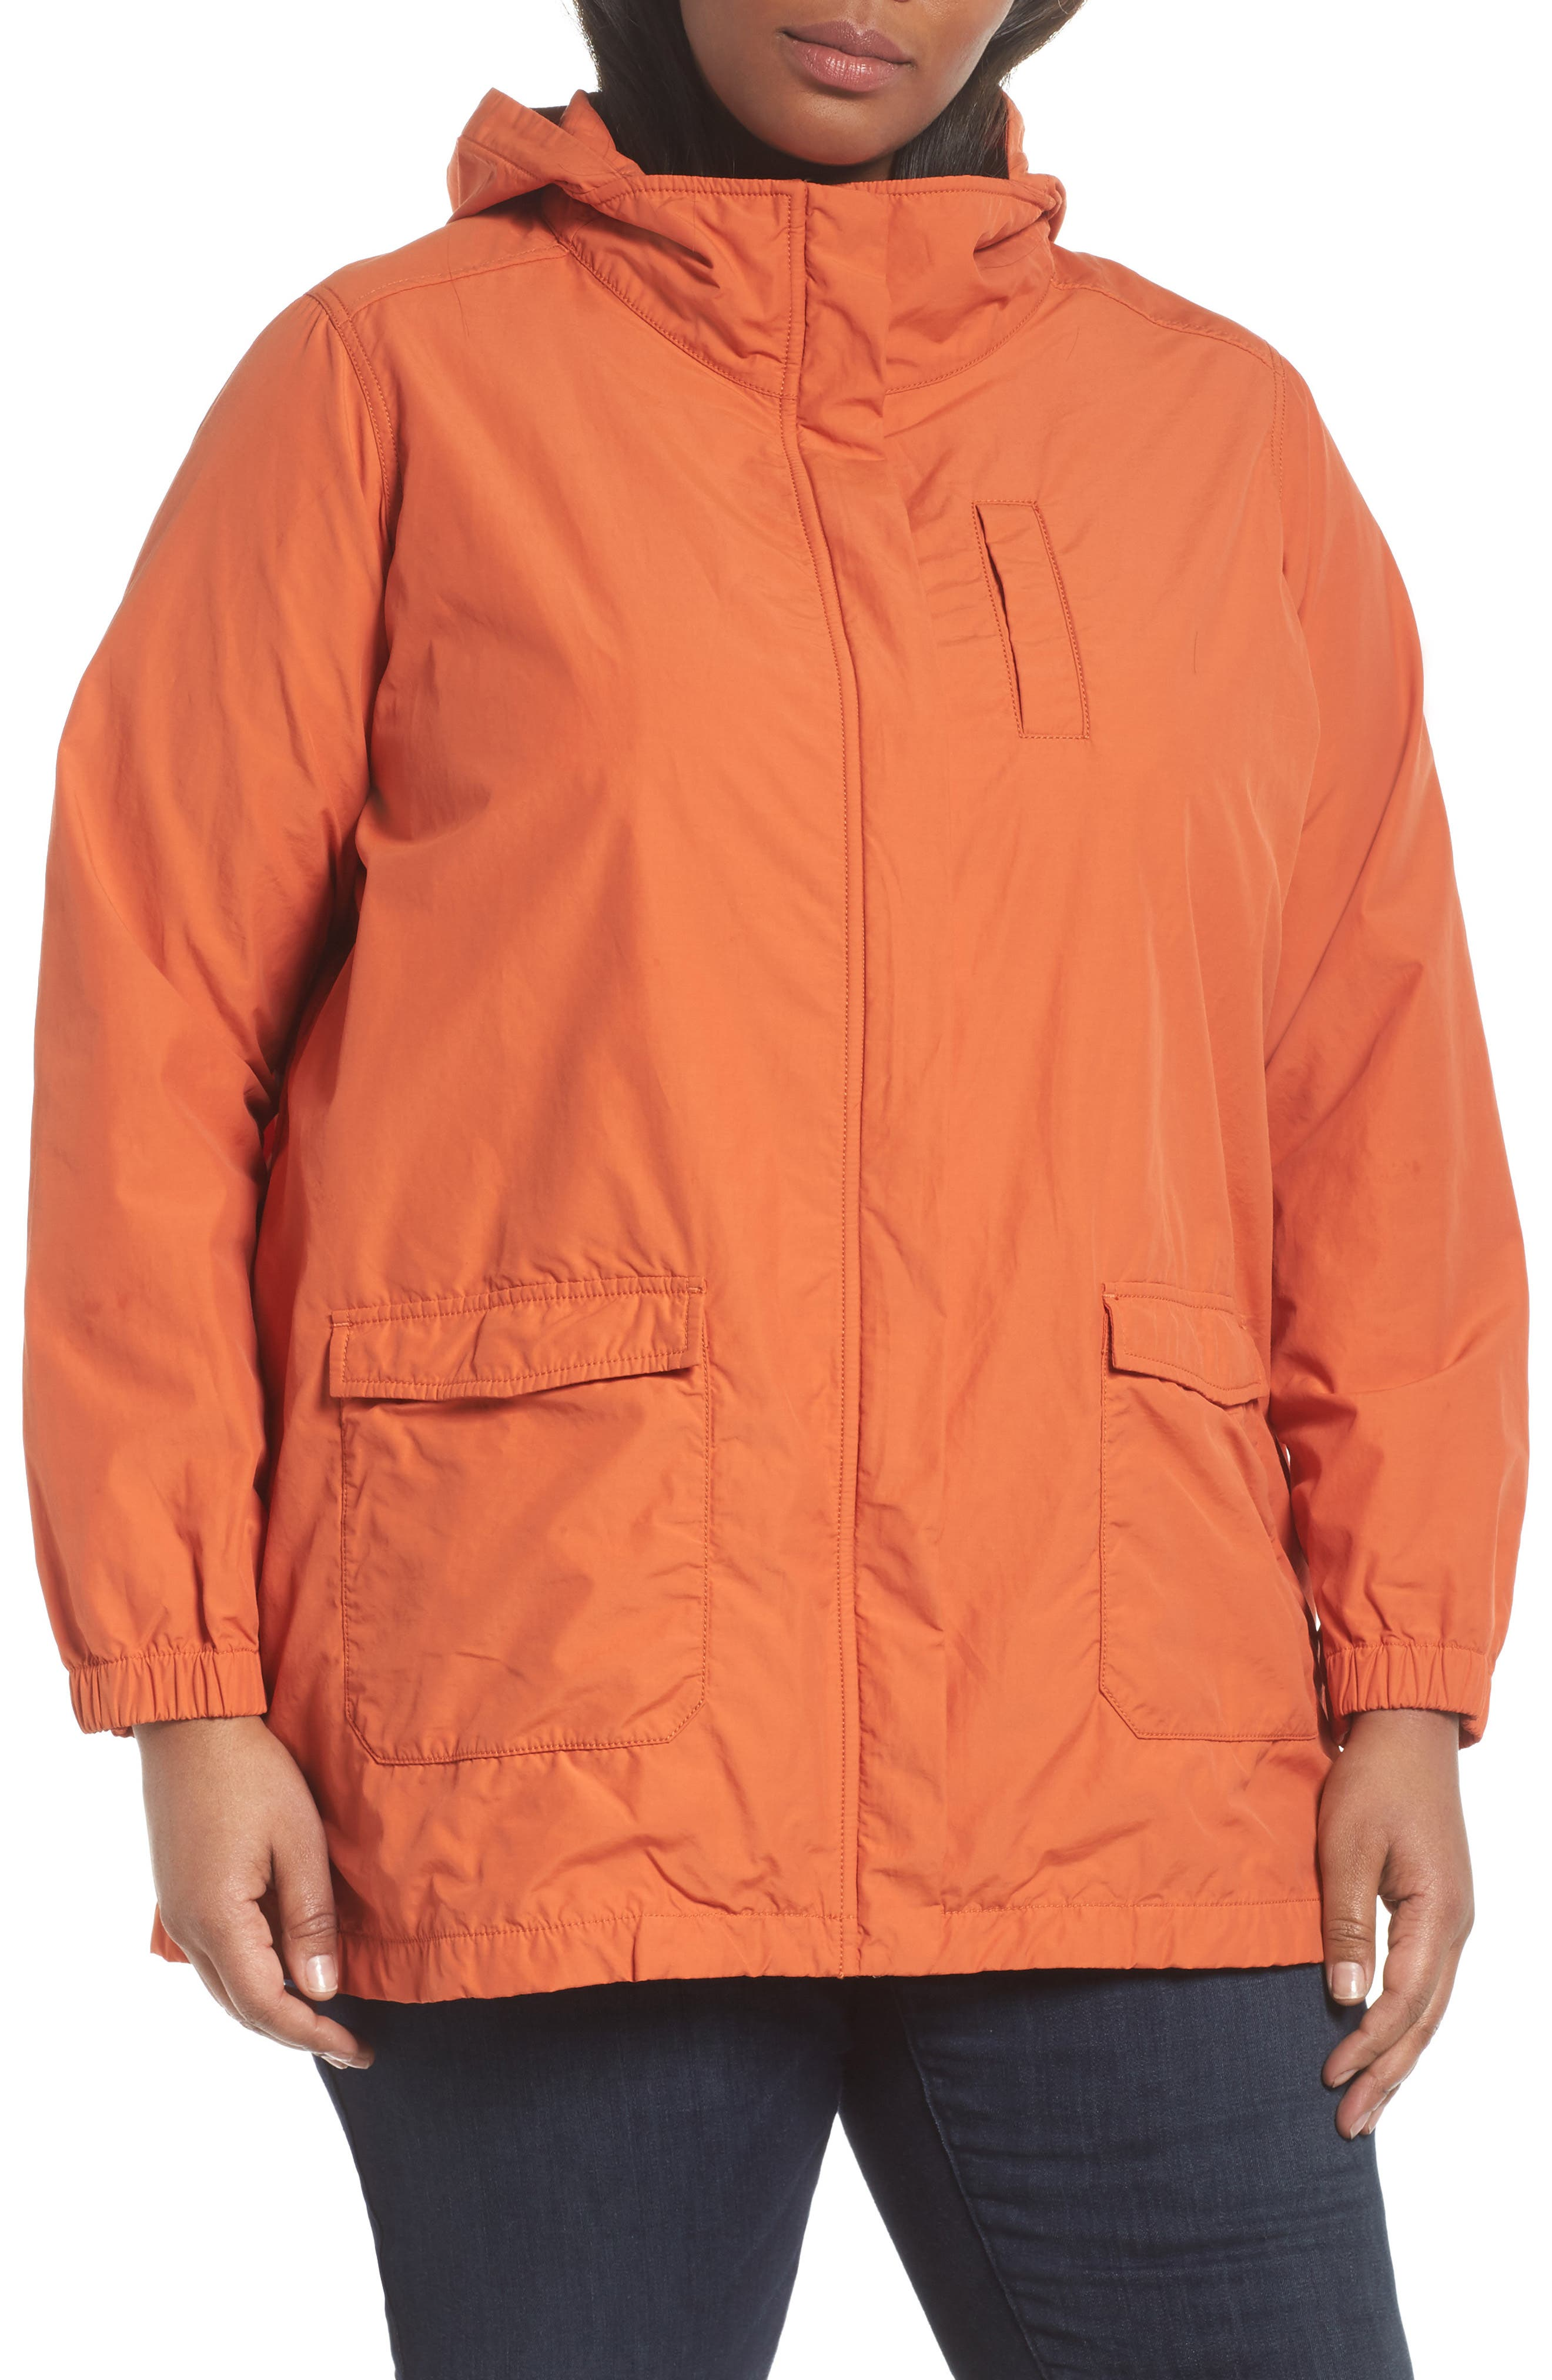 Hooded Organic Cotton Blend Jacket,                             Alternate thumbnail 4, color,                             001